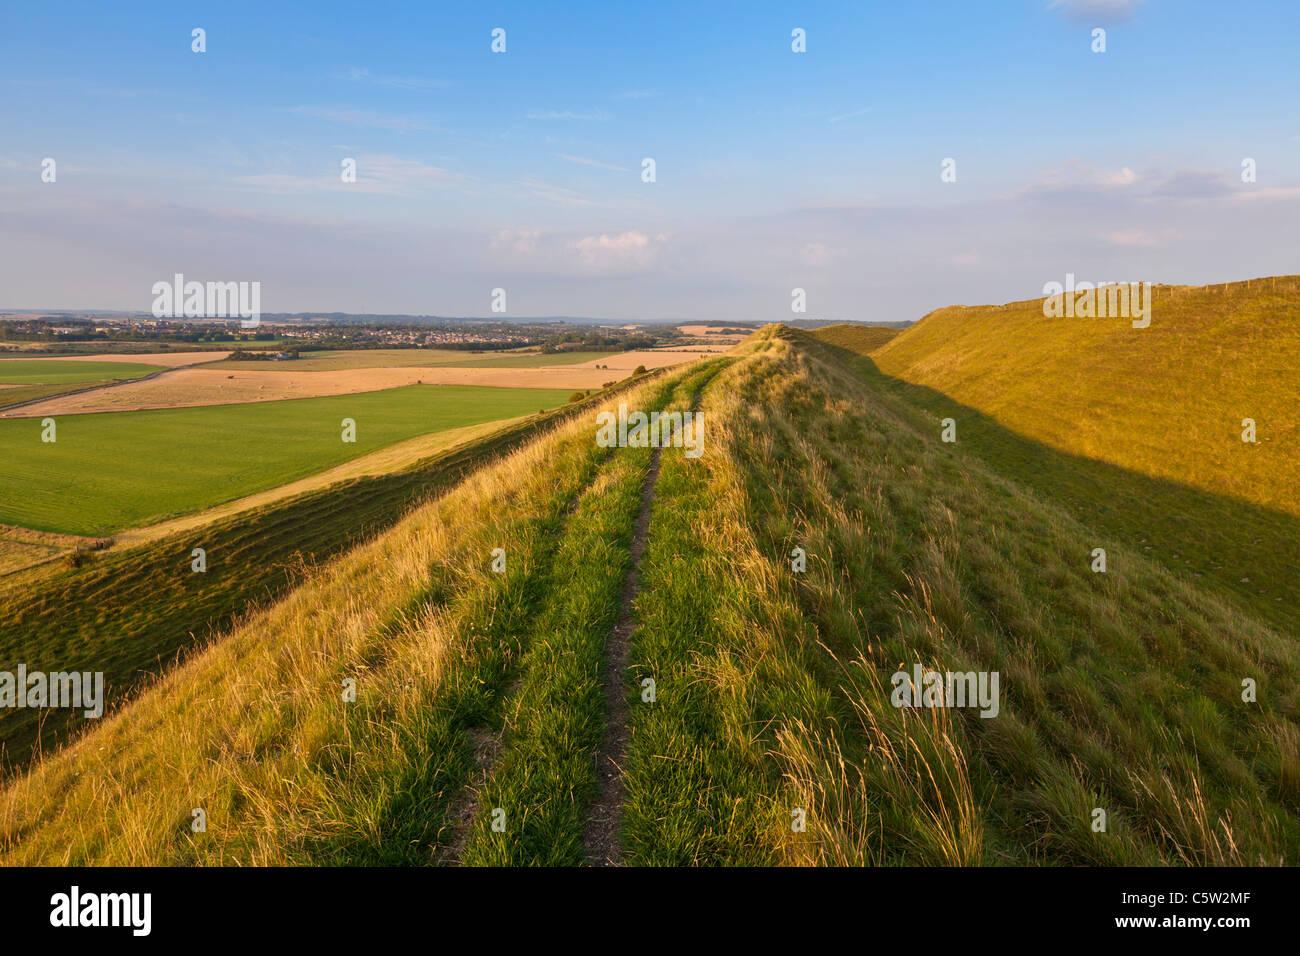 Maiden Castle an Iron Age hill fort near Dorchester Dorset England UK GB EU Europe Stock Photo